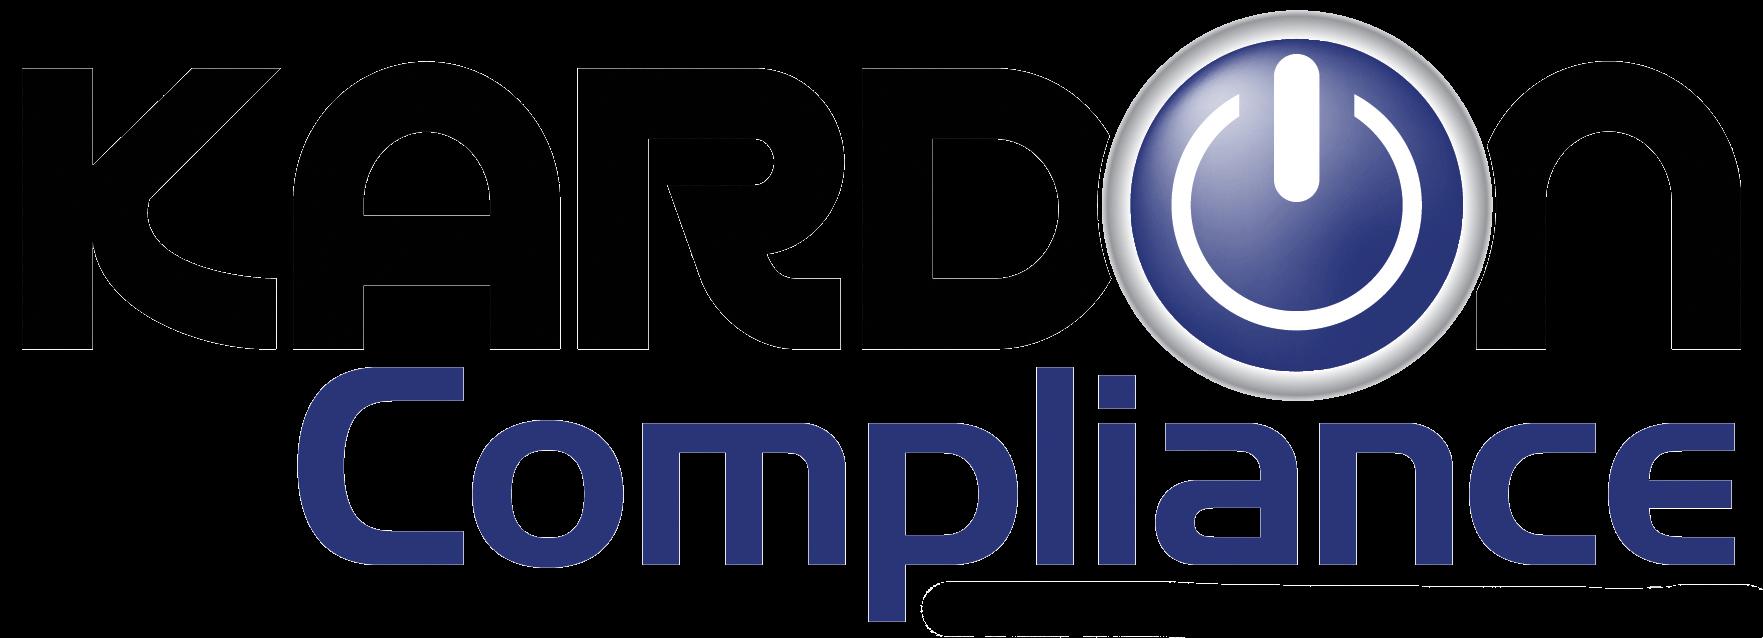 KardonCompliance.com